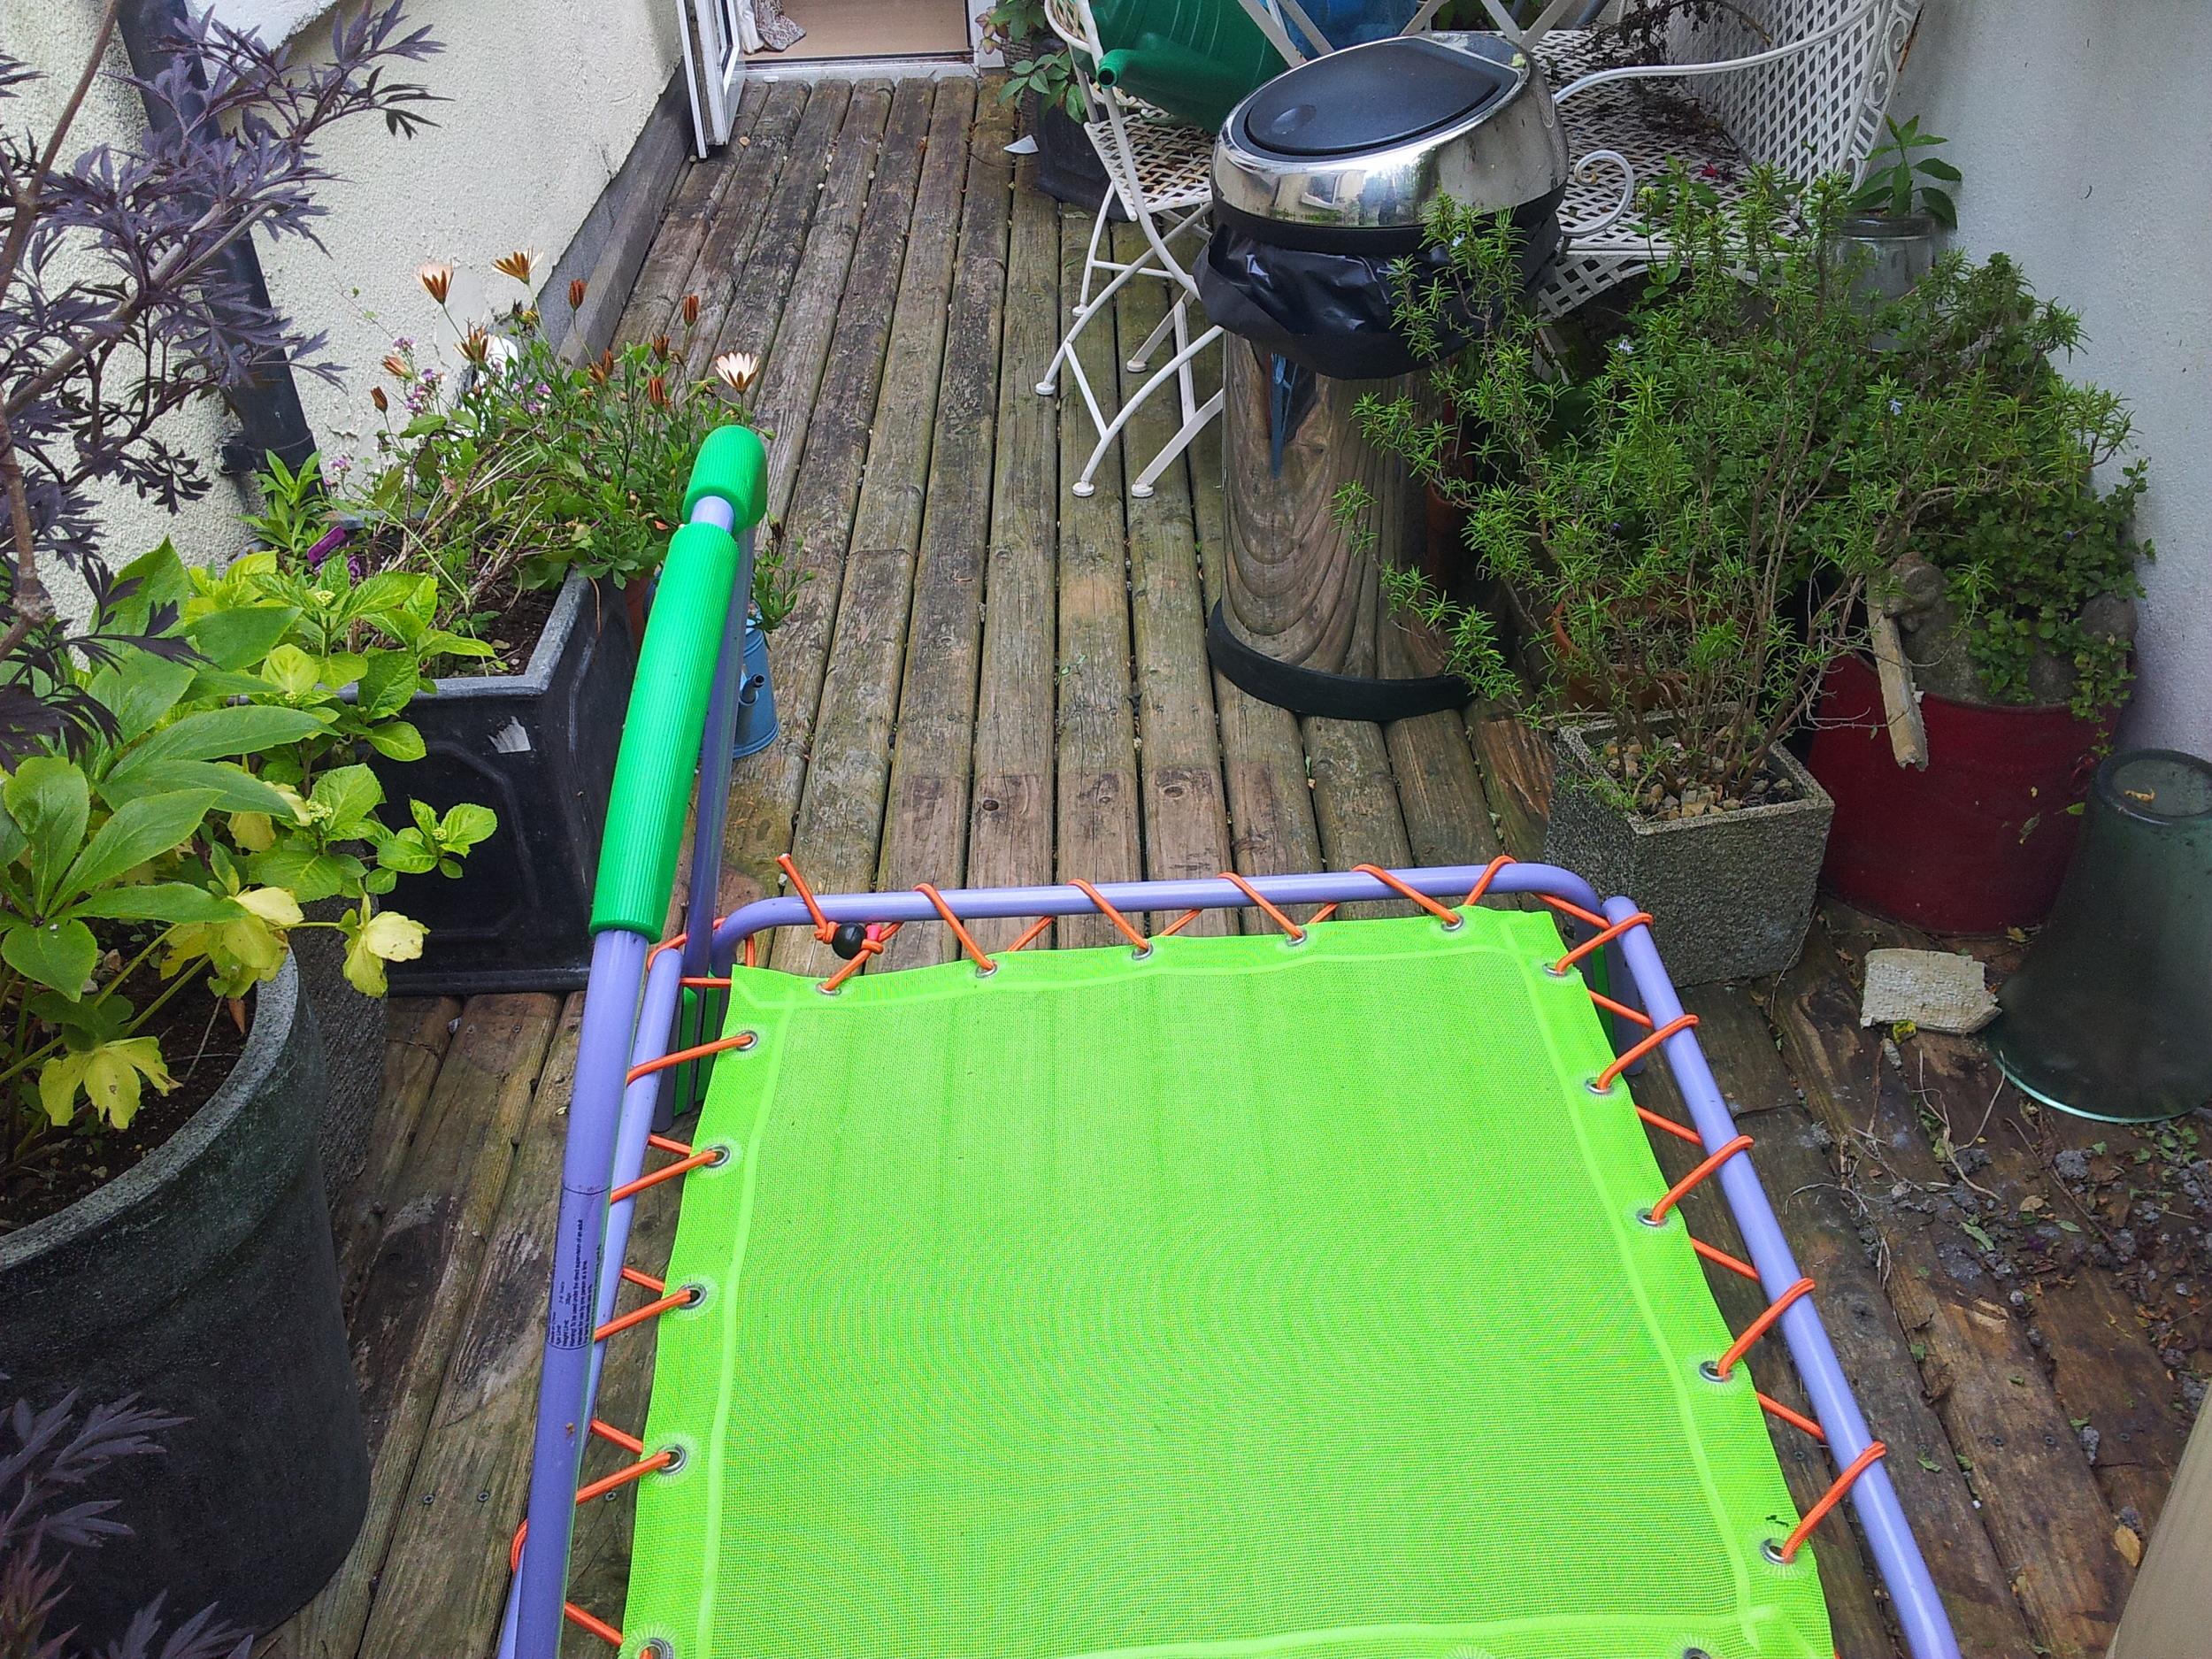 Garden decking before turf install